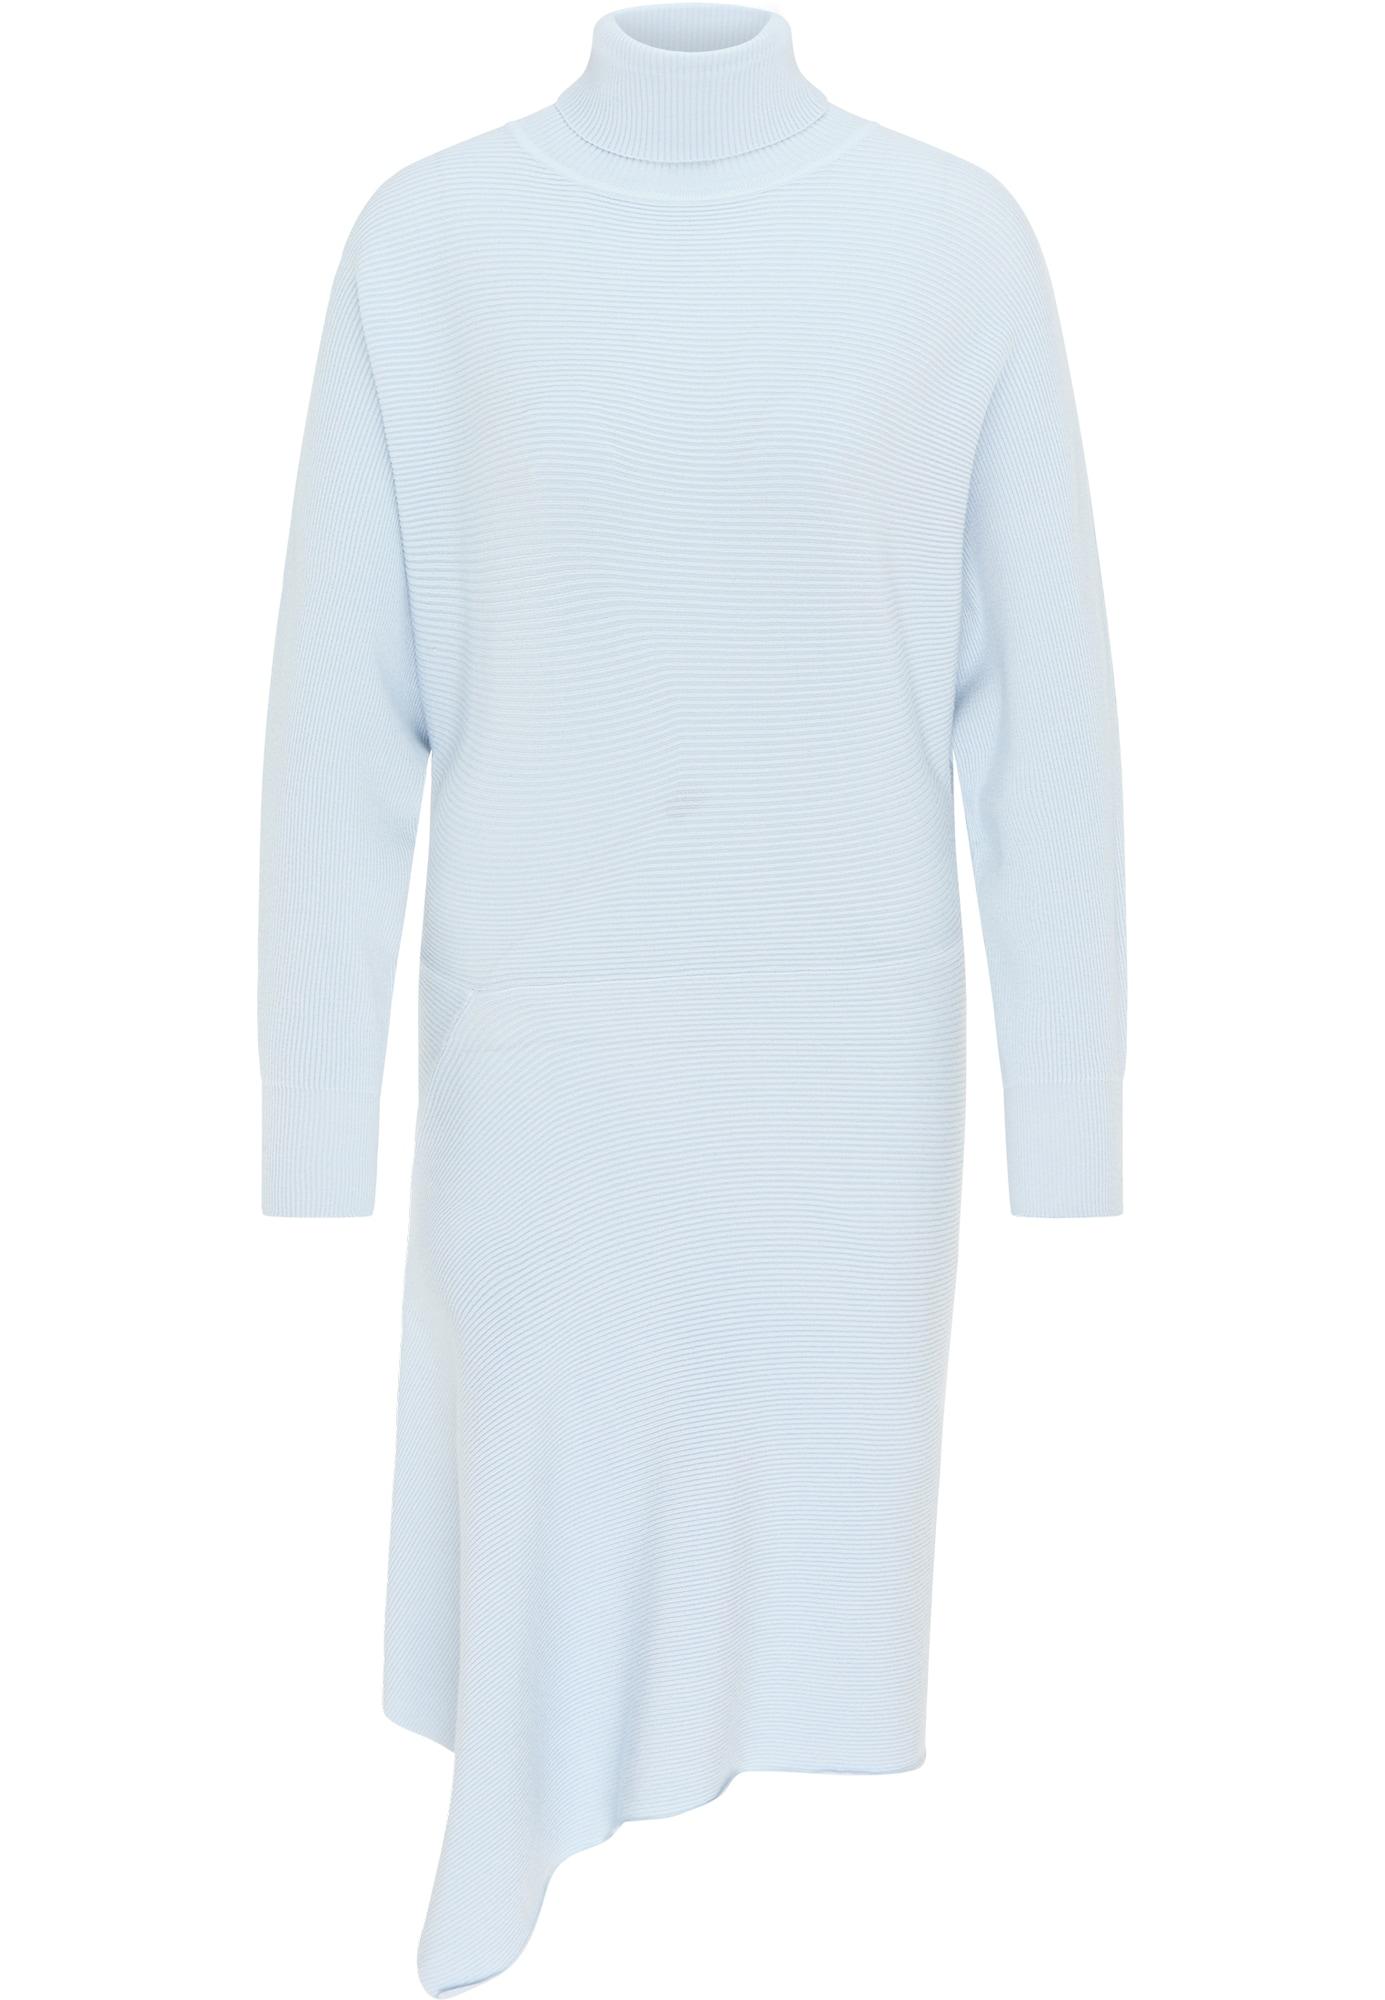 usha WHITE LABEL Megzta suknelė šviesiai mėlyna